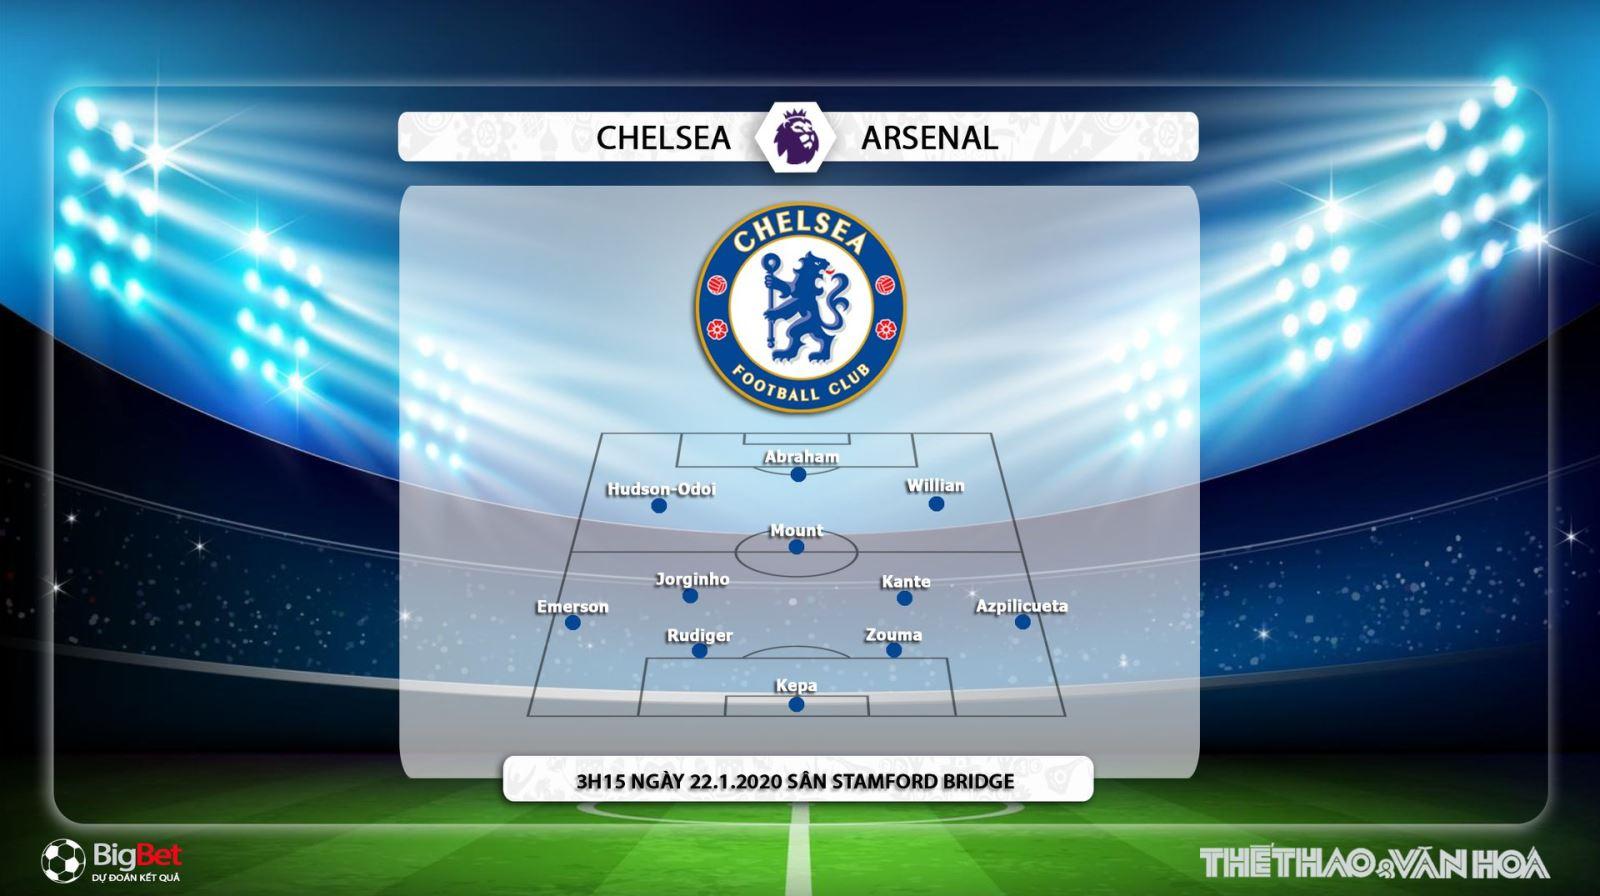 Chelsea vs Arsenal, Chelsea, Arsenal, nhận định  Chelsea vs Arsenal, trực tiếp  Chelsea vs Arsenal, chelsea đấu với arsenal, bóng đá, bong da, K+, K+PM